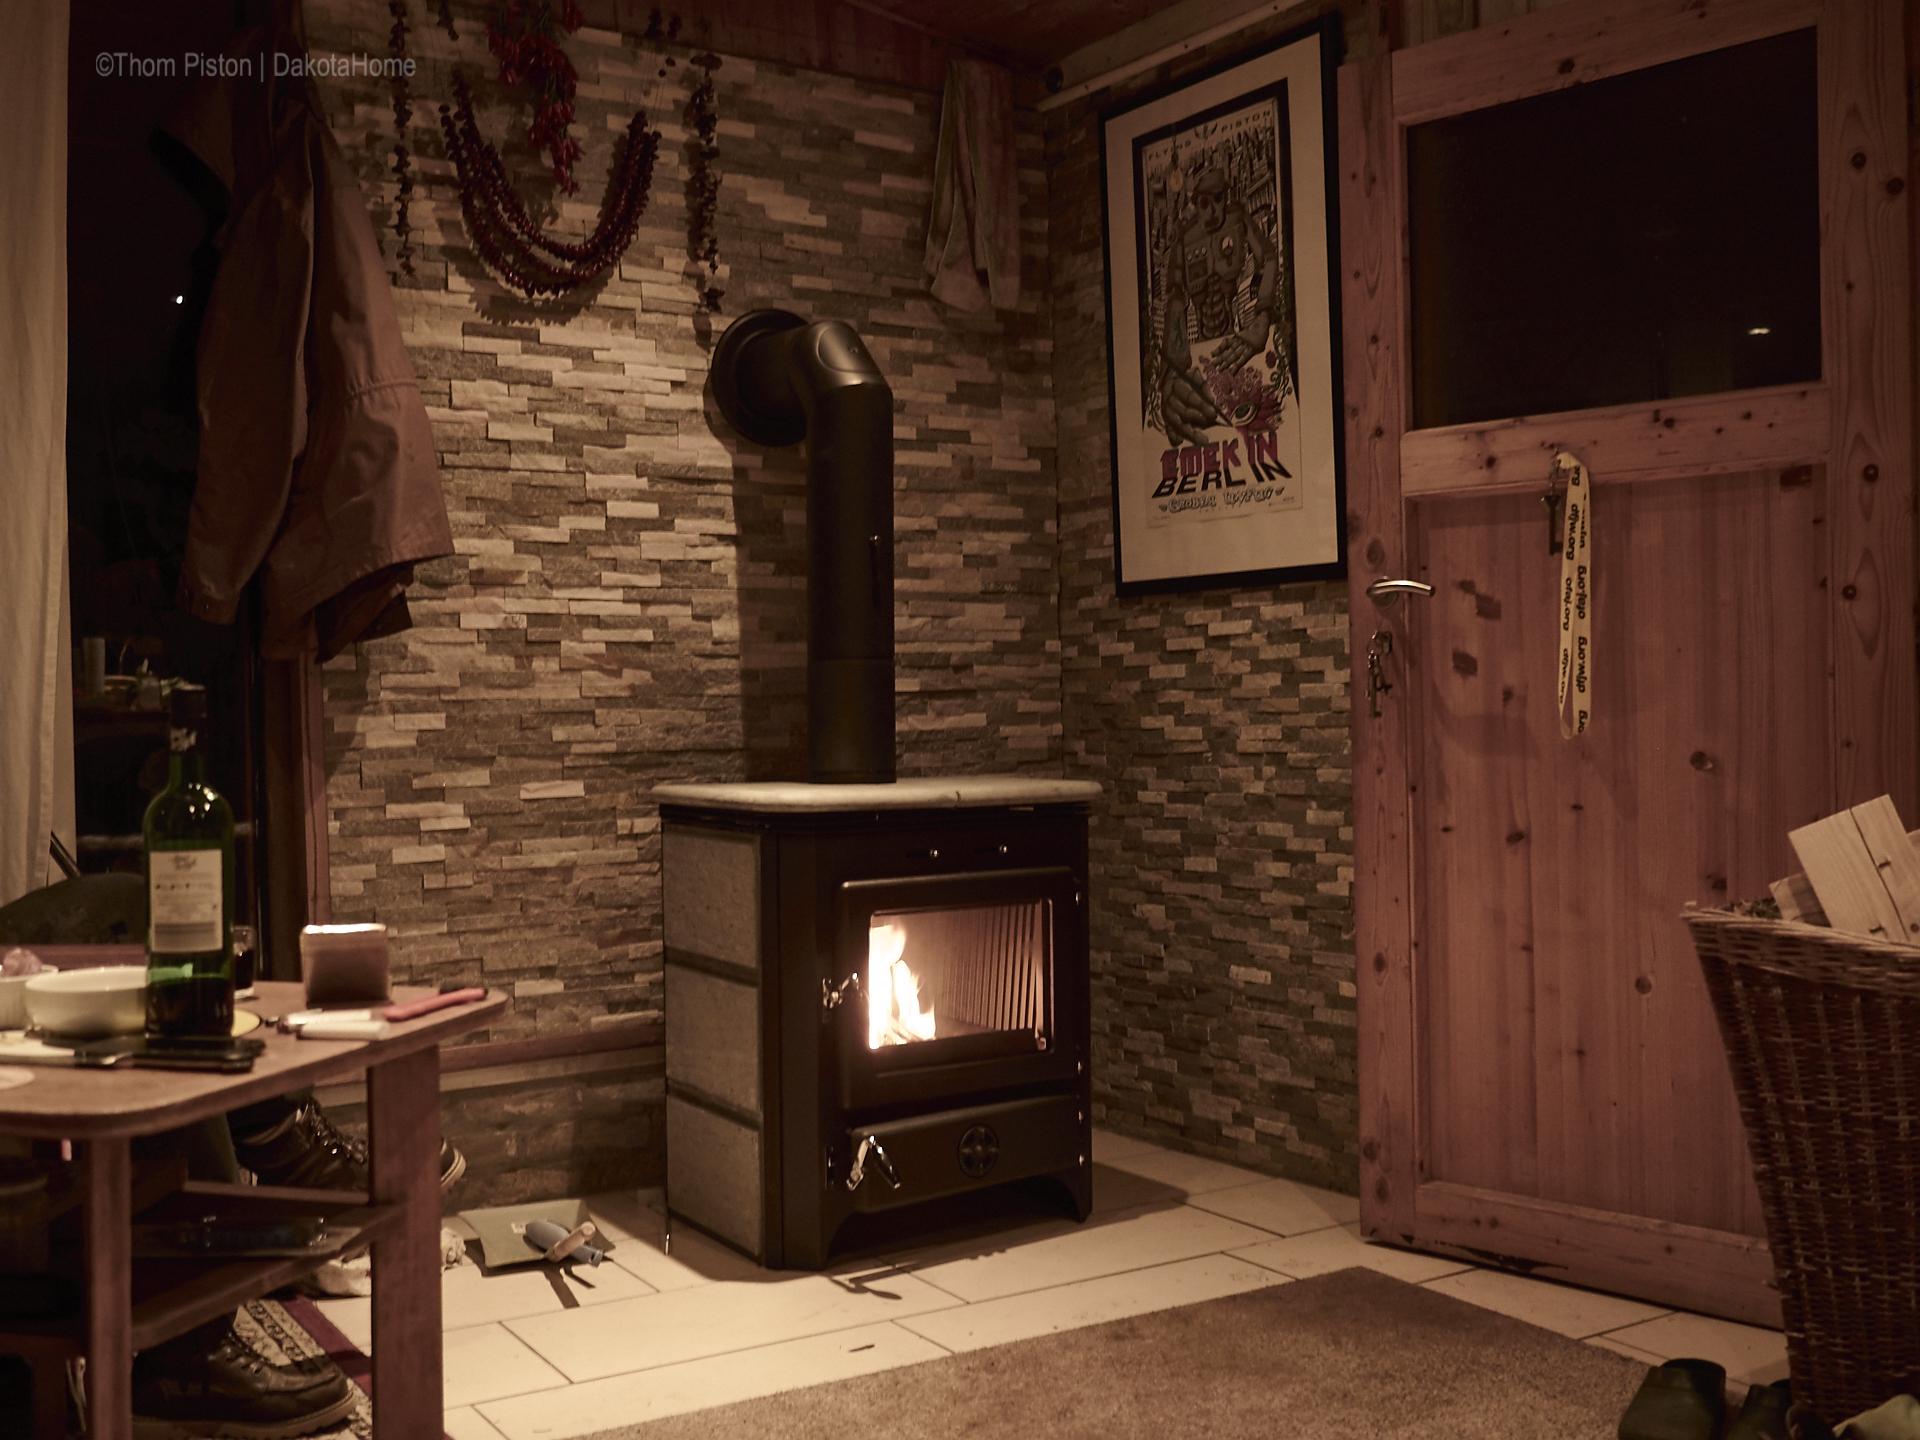 berlin rumfest neuer kamin neues bett und herbst dakota home. Black Bedroom Furniture Sets. Home Design Ideas